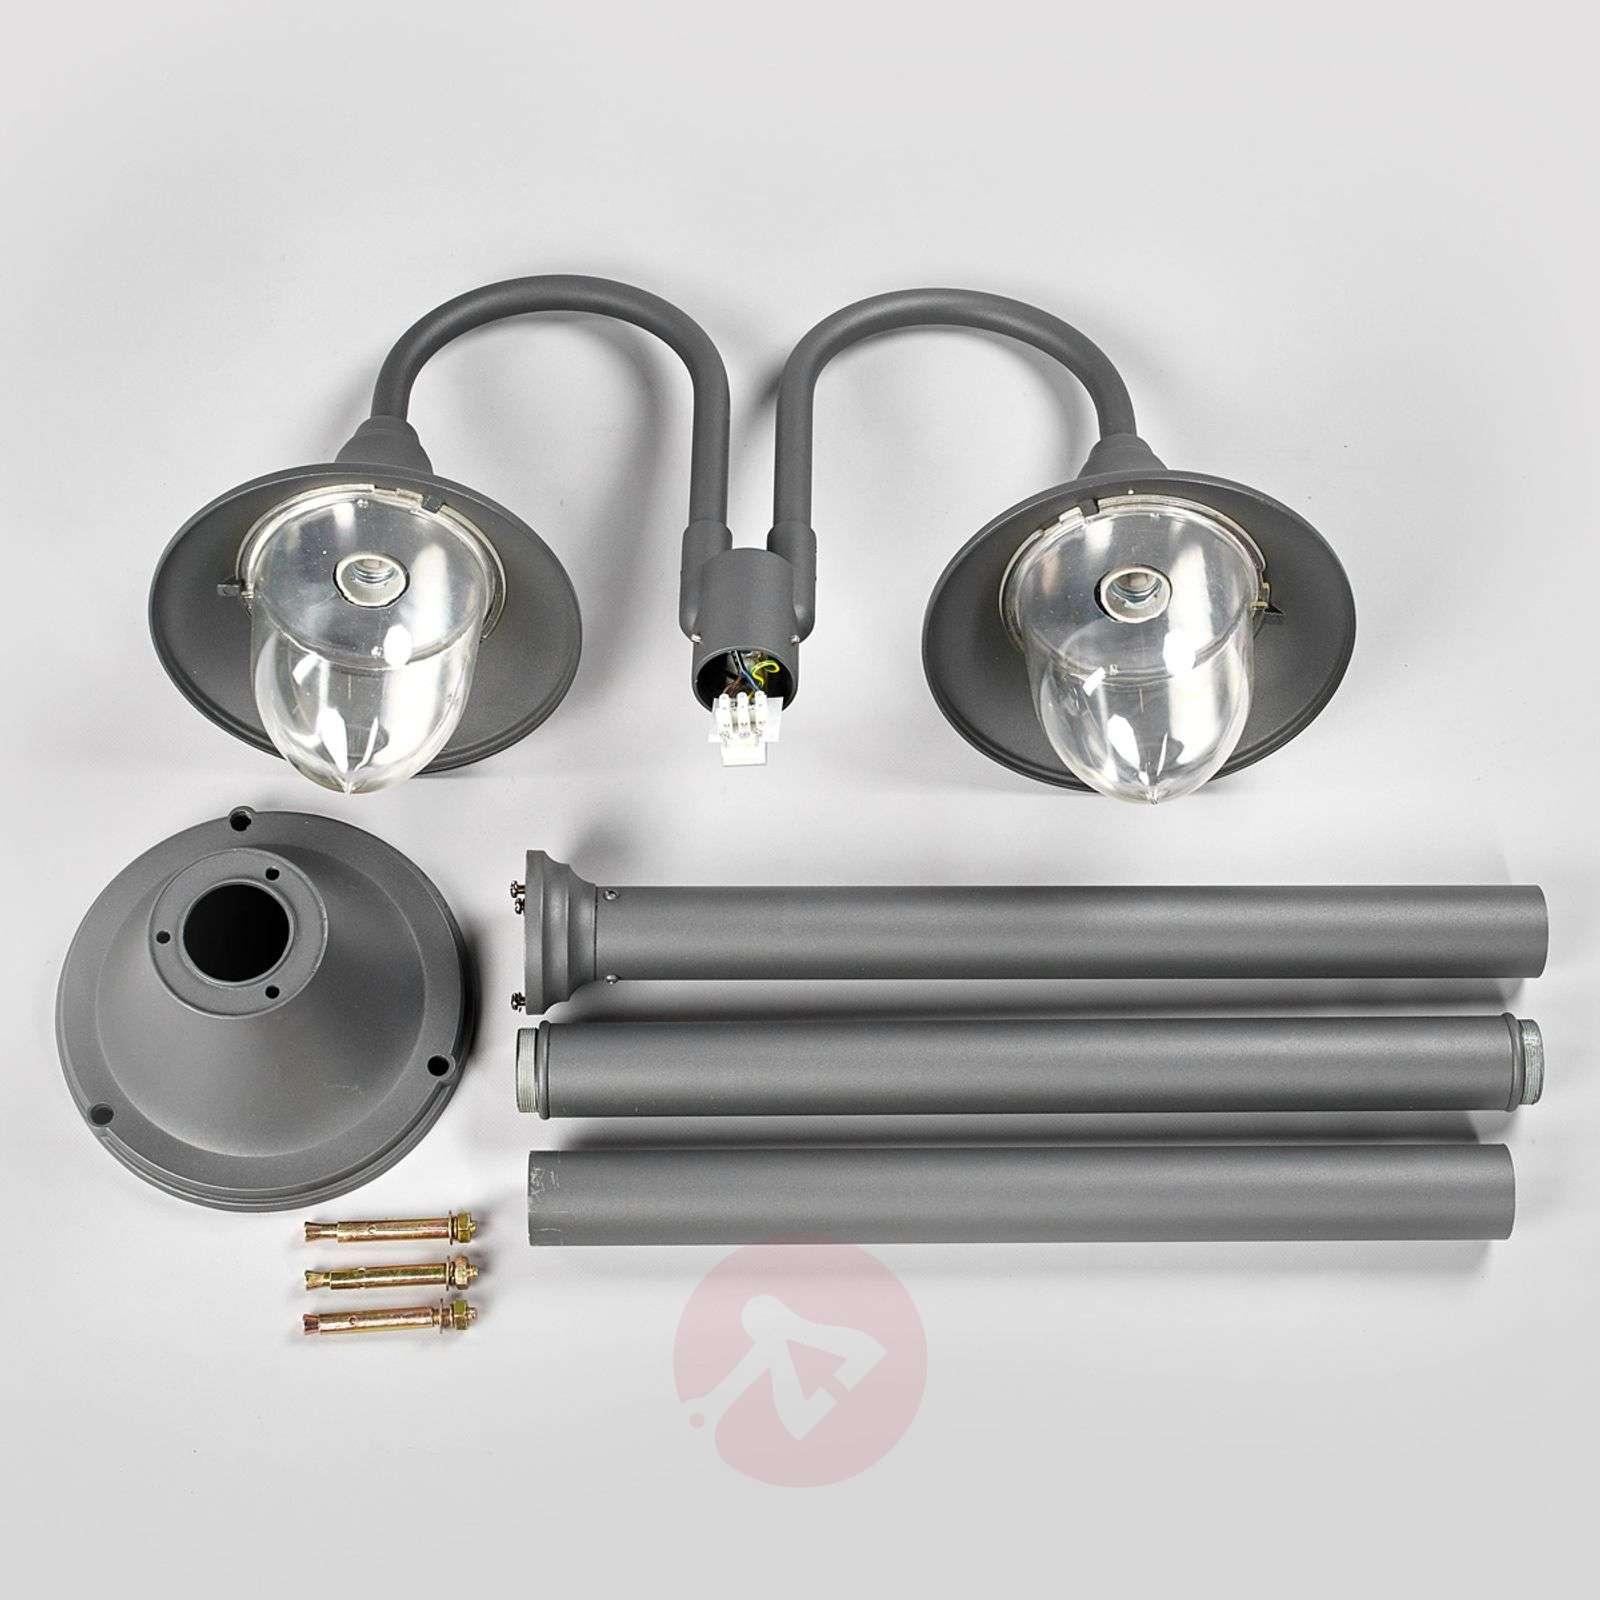 Madea two-bulb post light-9630067-01